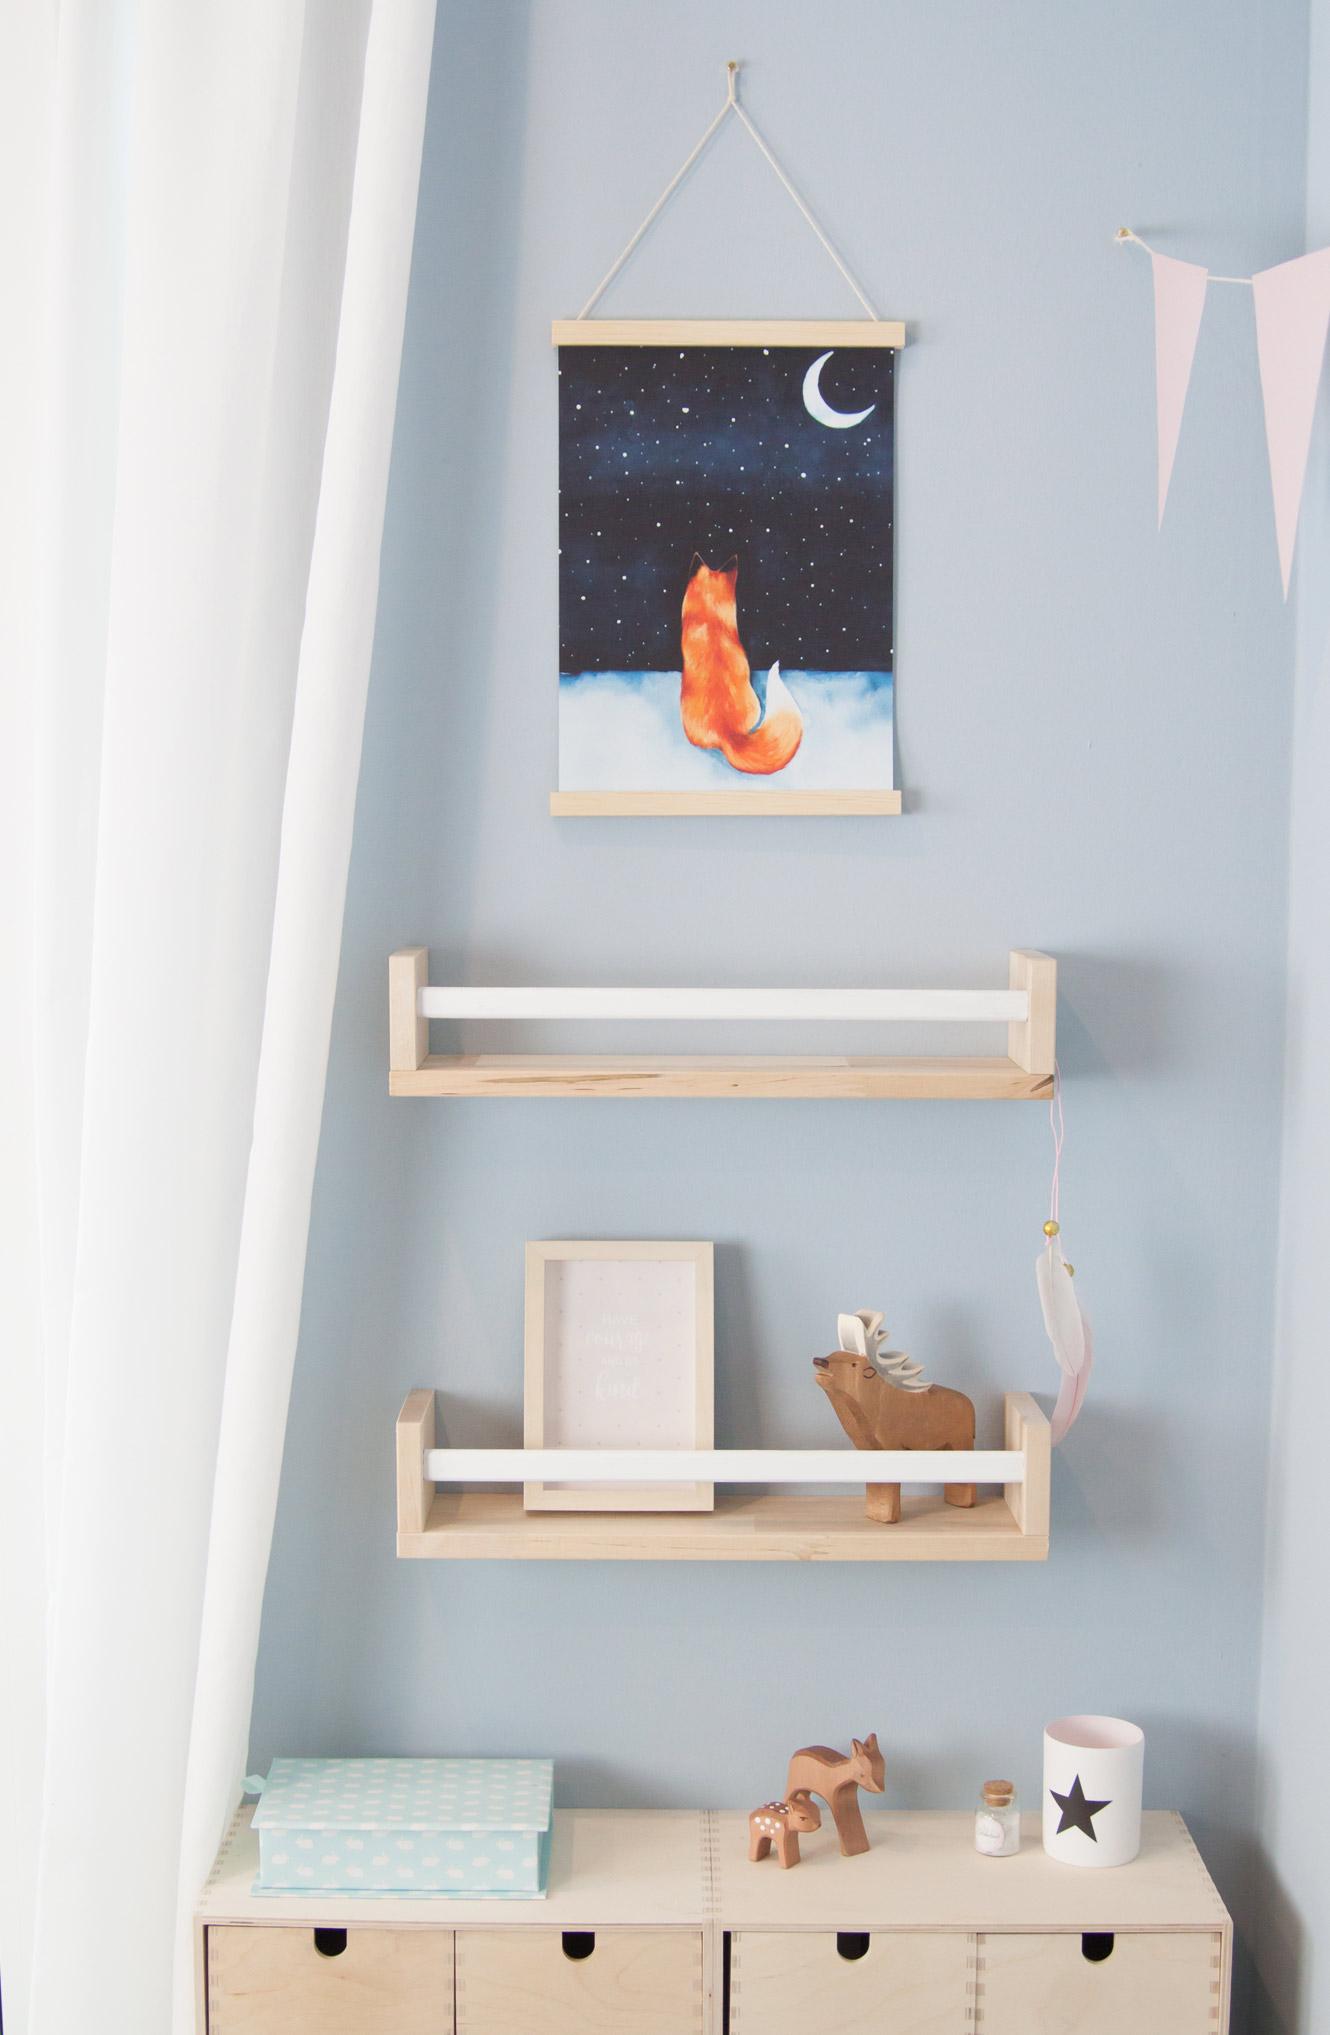 Kinderzimmer Bilderleiste DIY